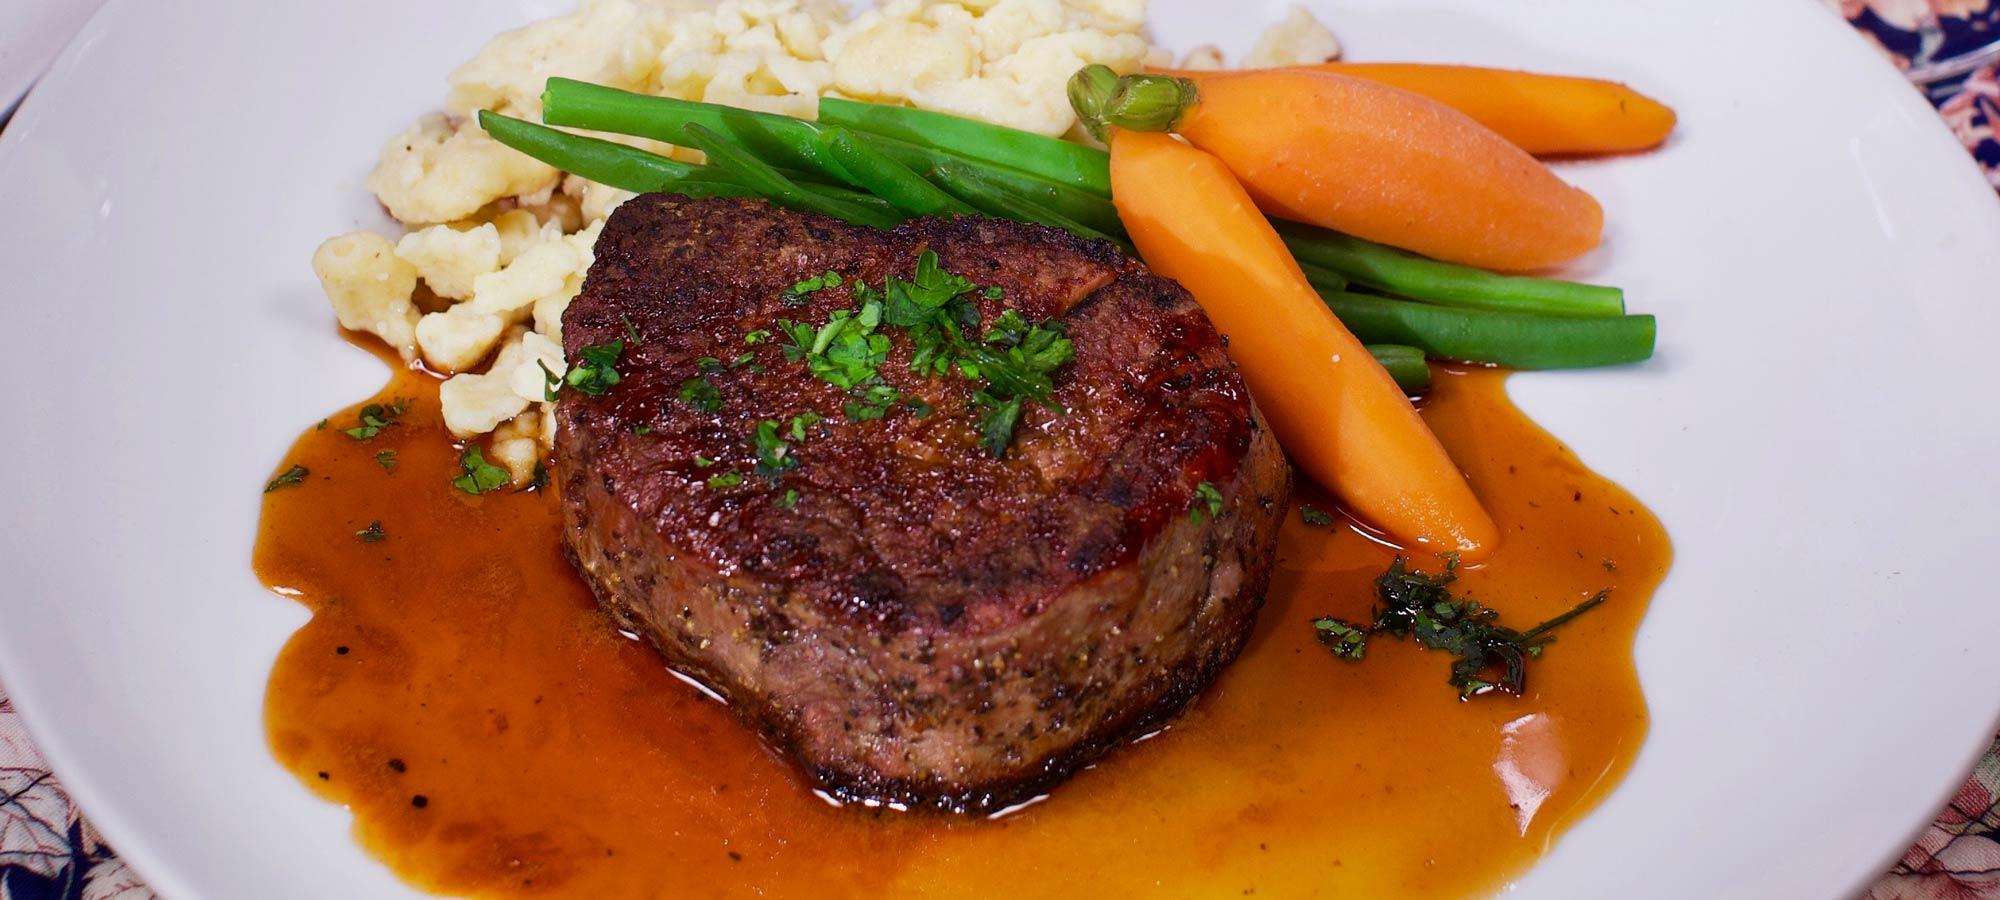 Beef Tenderloin Sauerbraten at countryman's Pleasure Restaurant in Rutland, VT